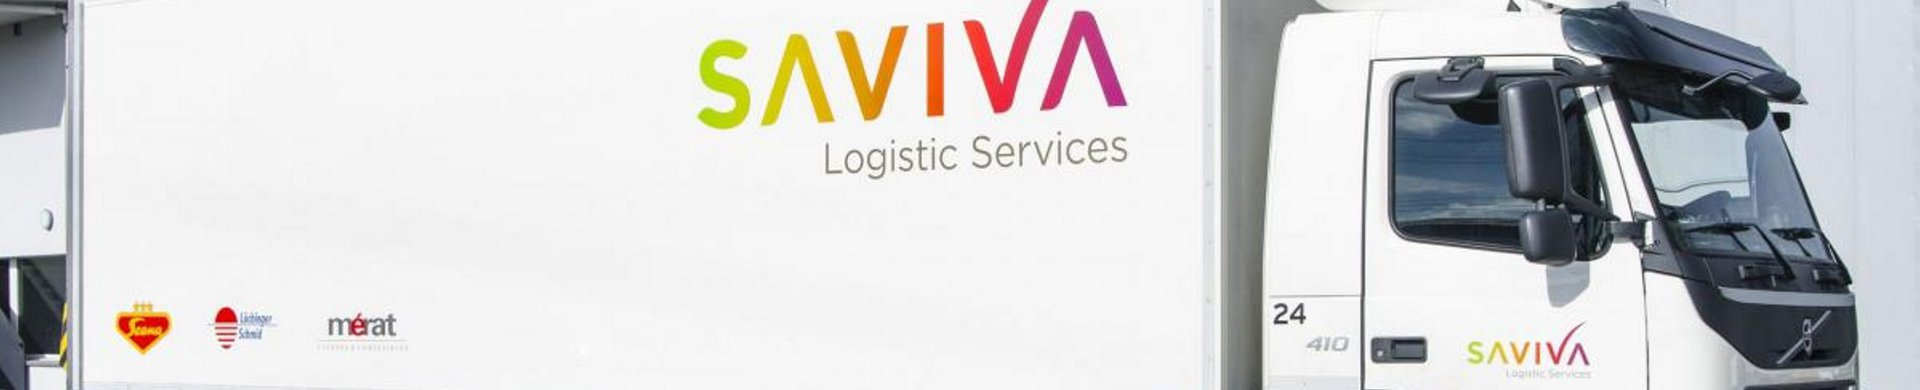 Saviva_Landingpage.jpg